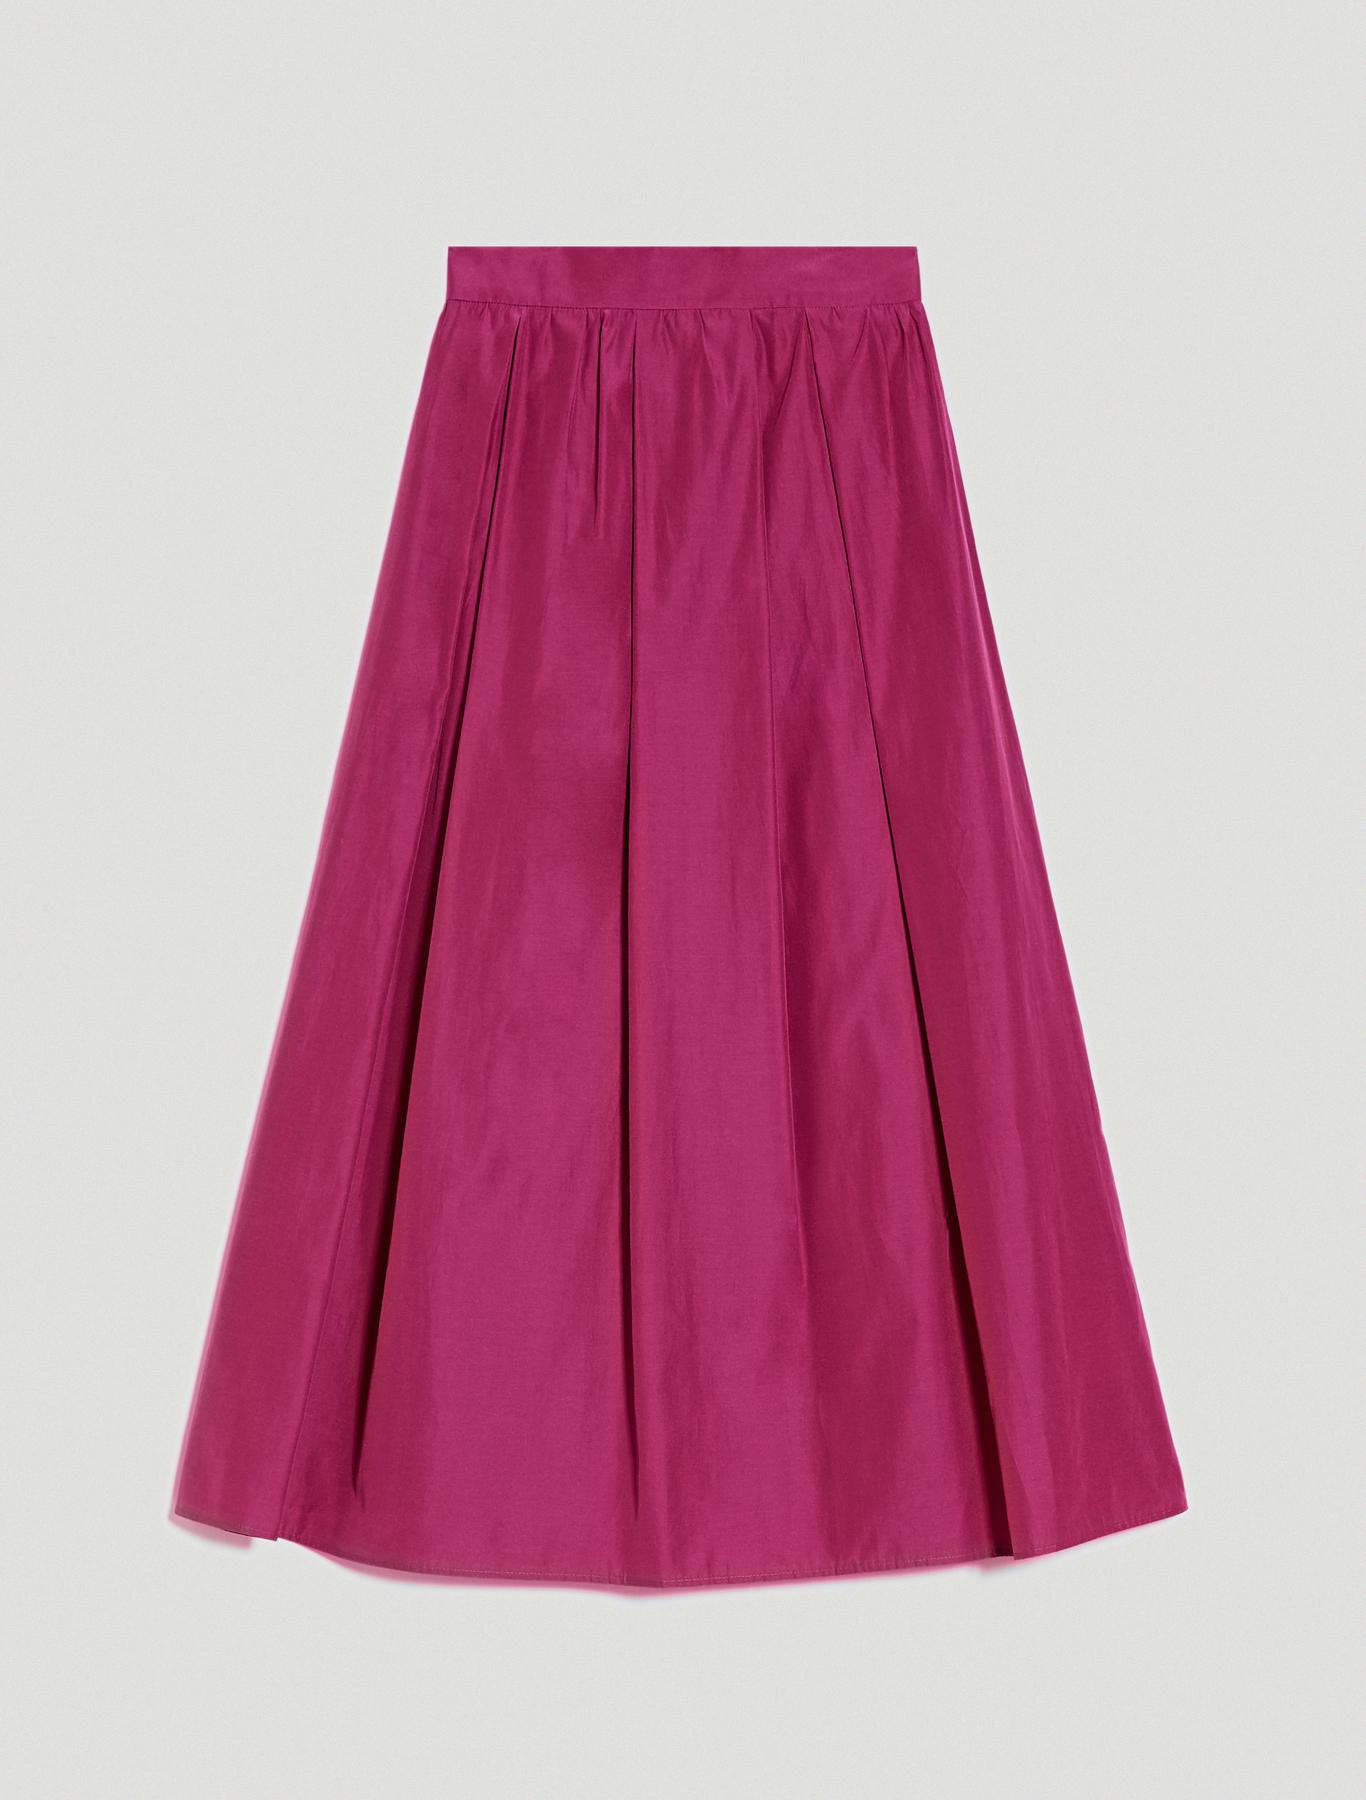 Pleated taffeta skirt - fuchsia - pennyblack